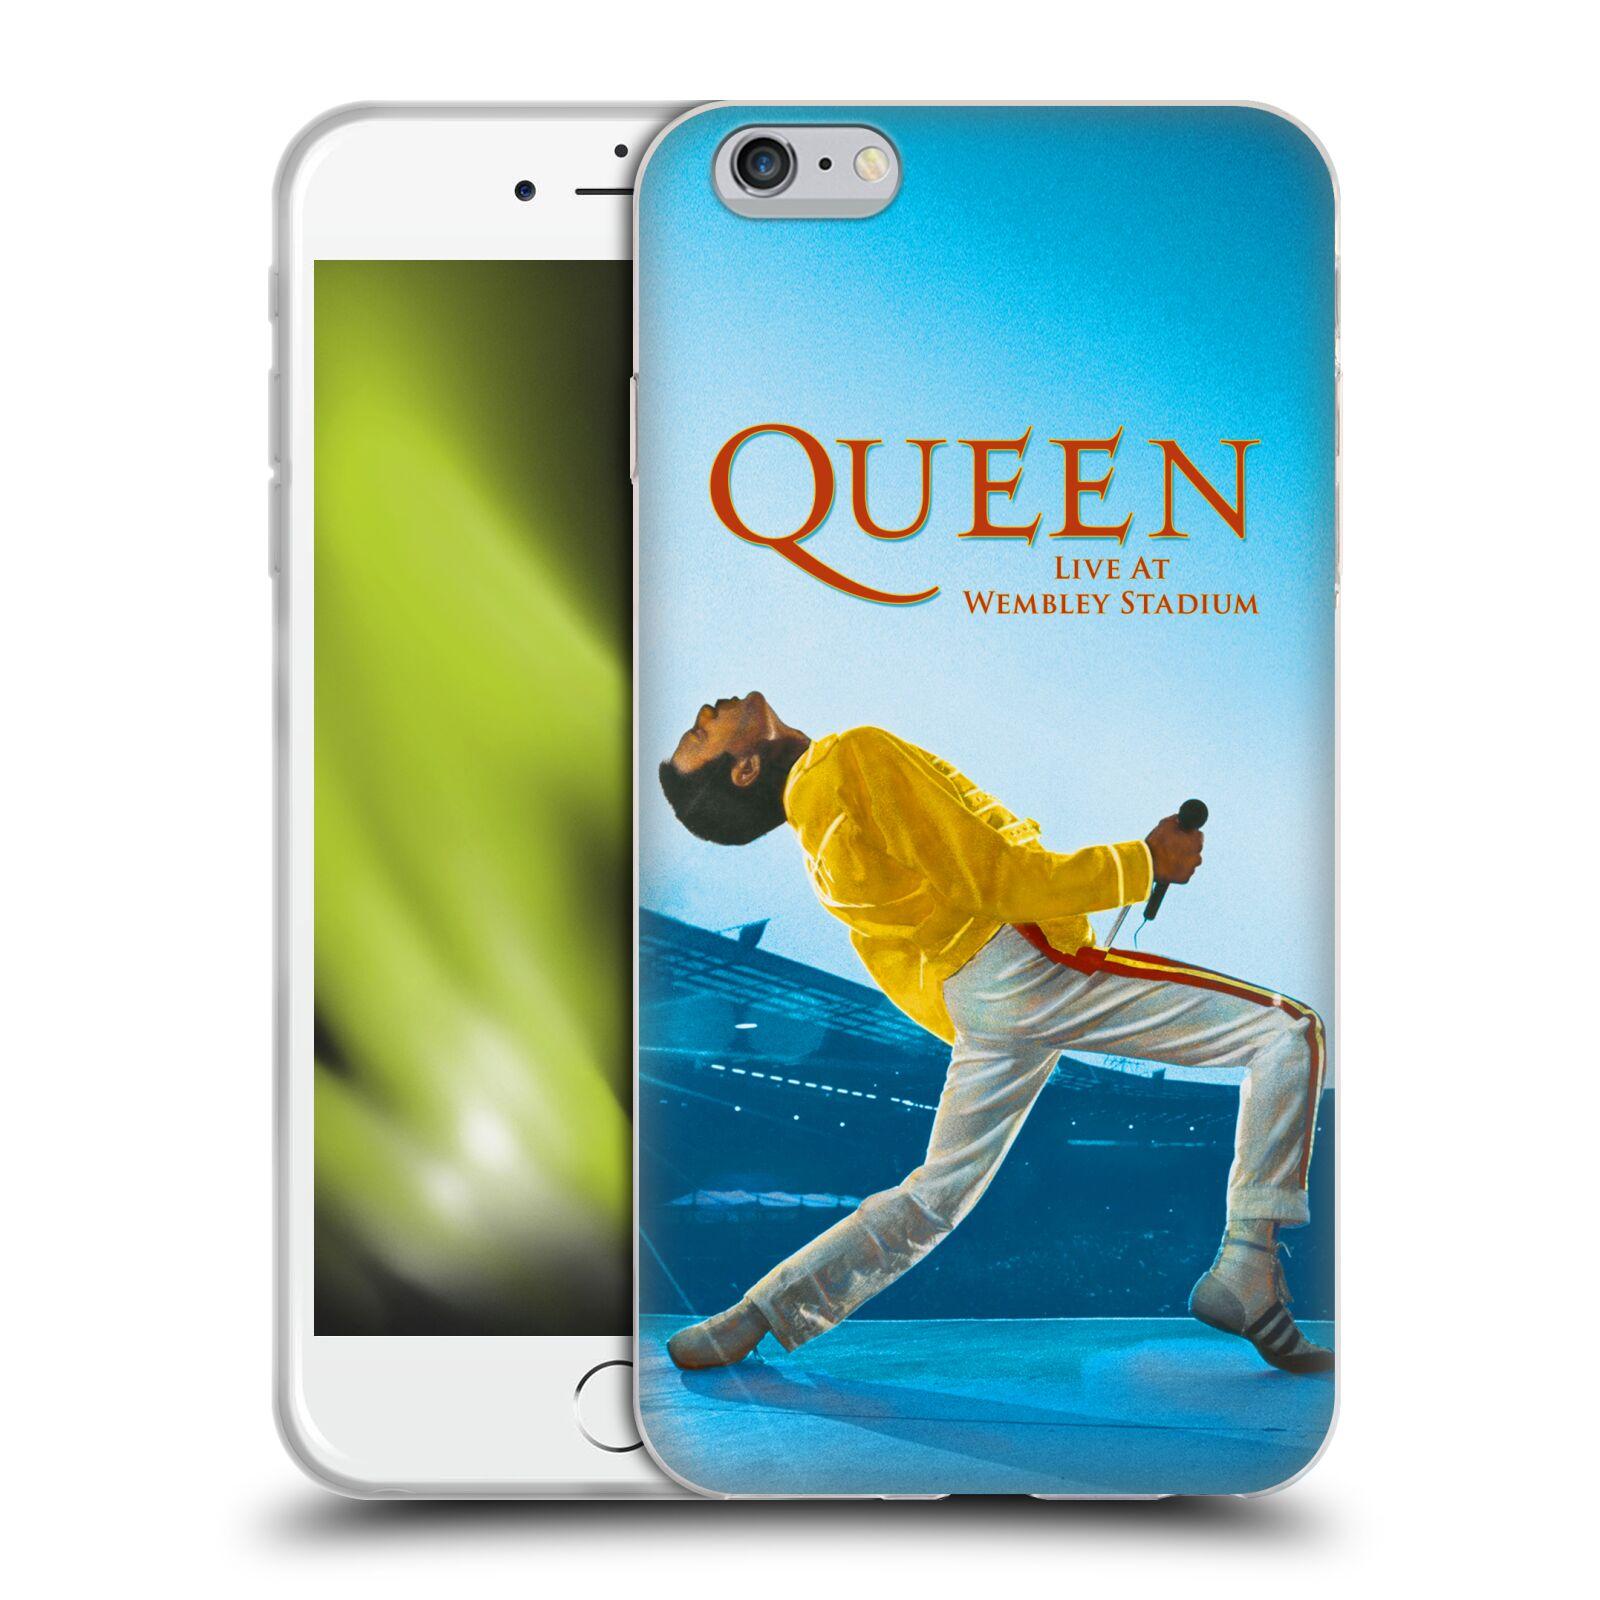 HEAD CASE silikonový obal na mobil Apple Iphone 6/6S PLUS zpěvák Queen skupina Freddie Mercury